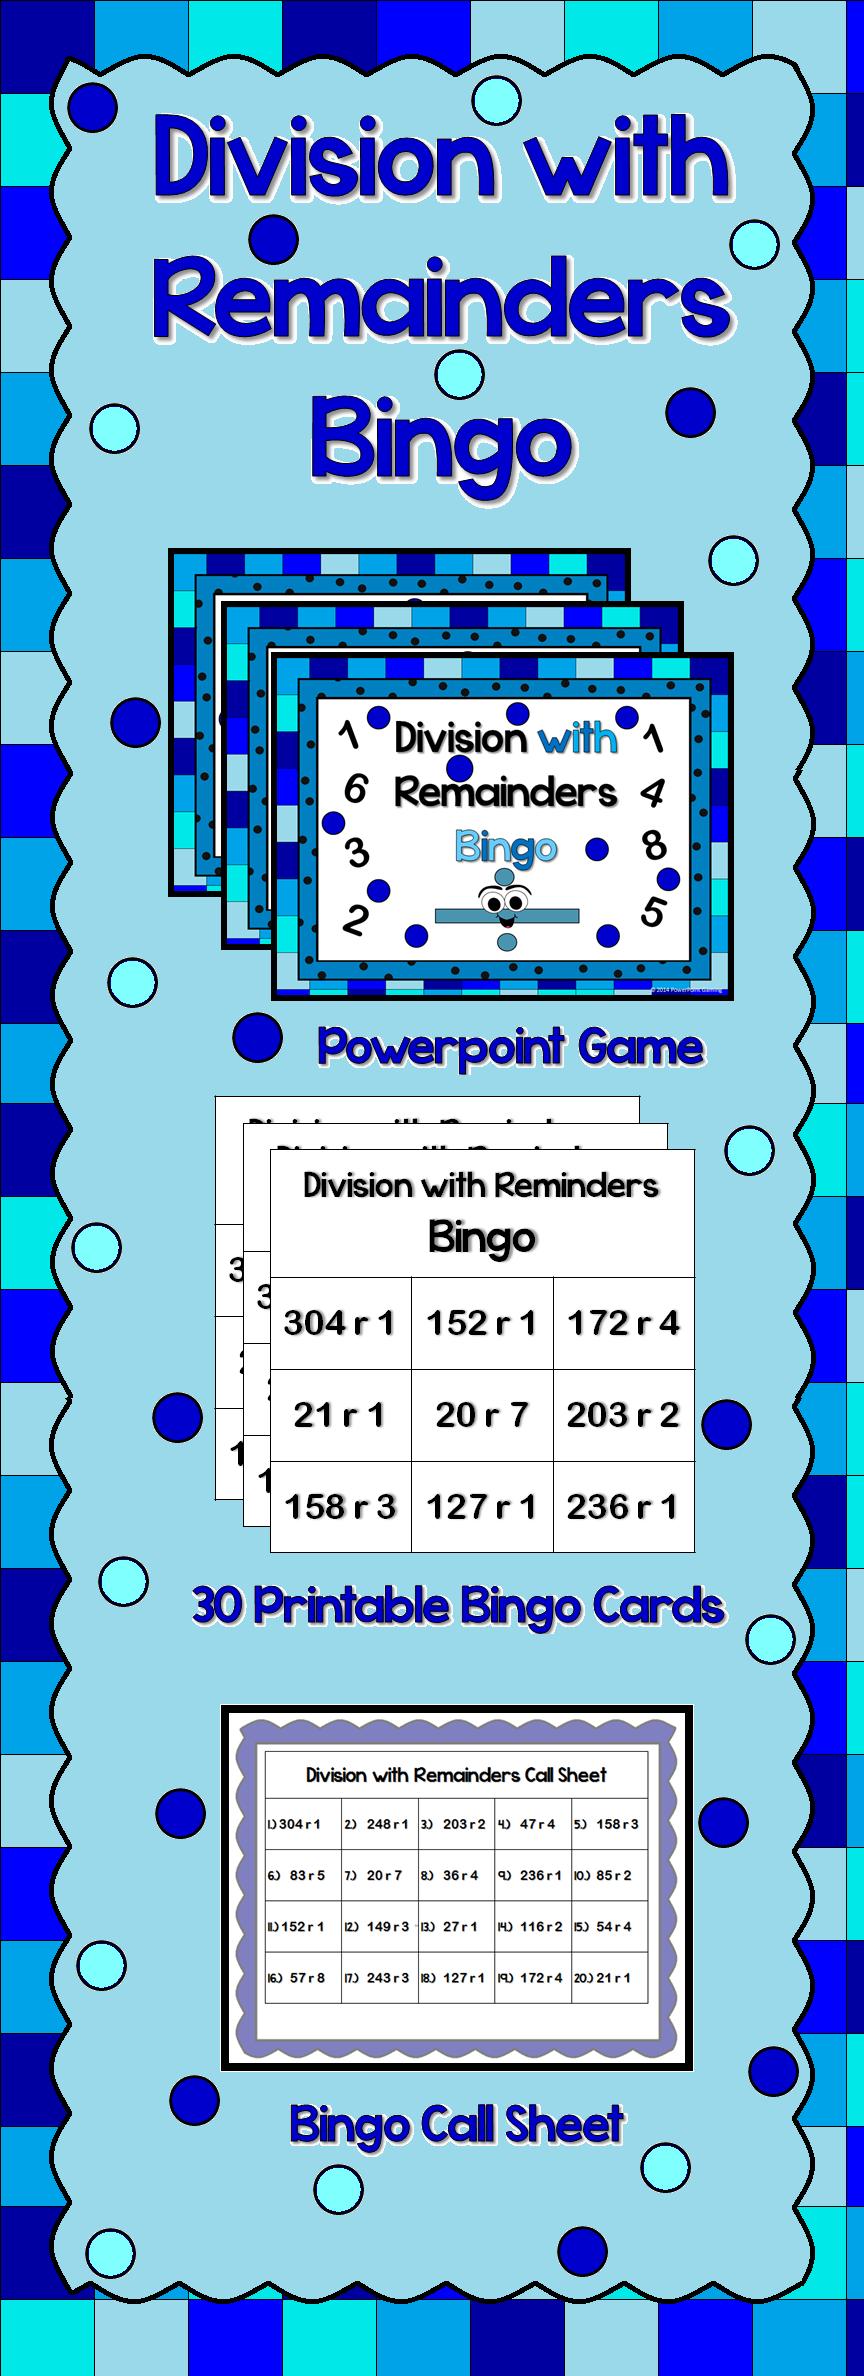 Bingo - Division with Remainders Powerpoint Game   Game calls, Bingo ...